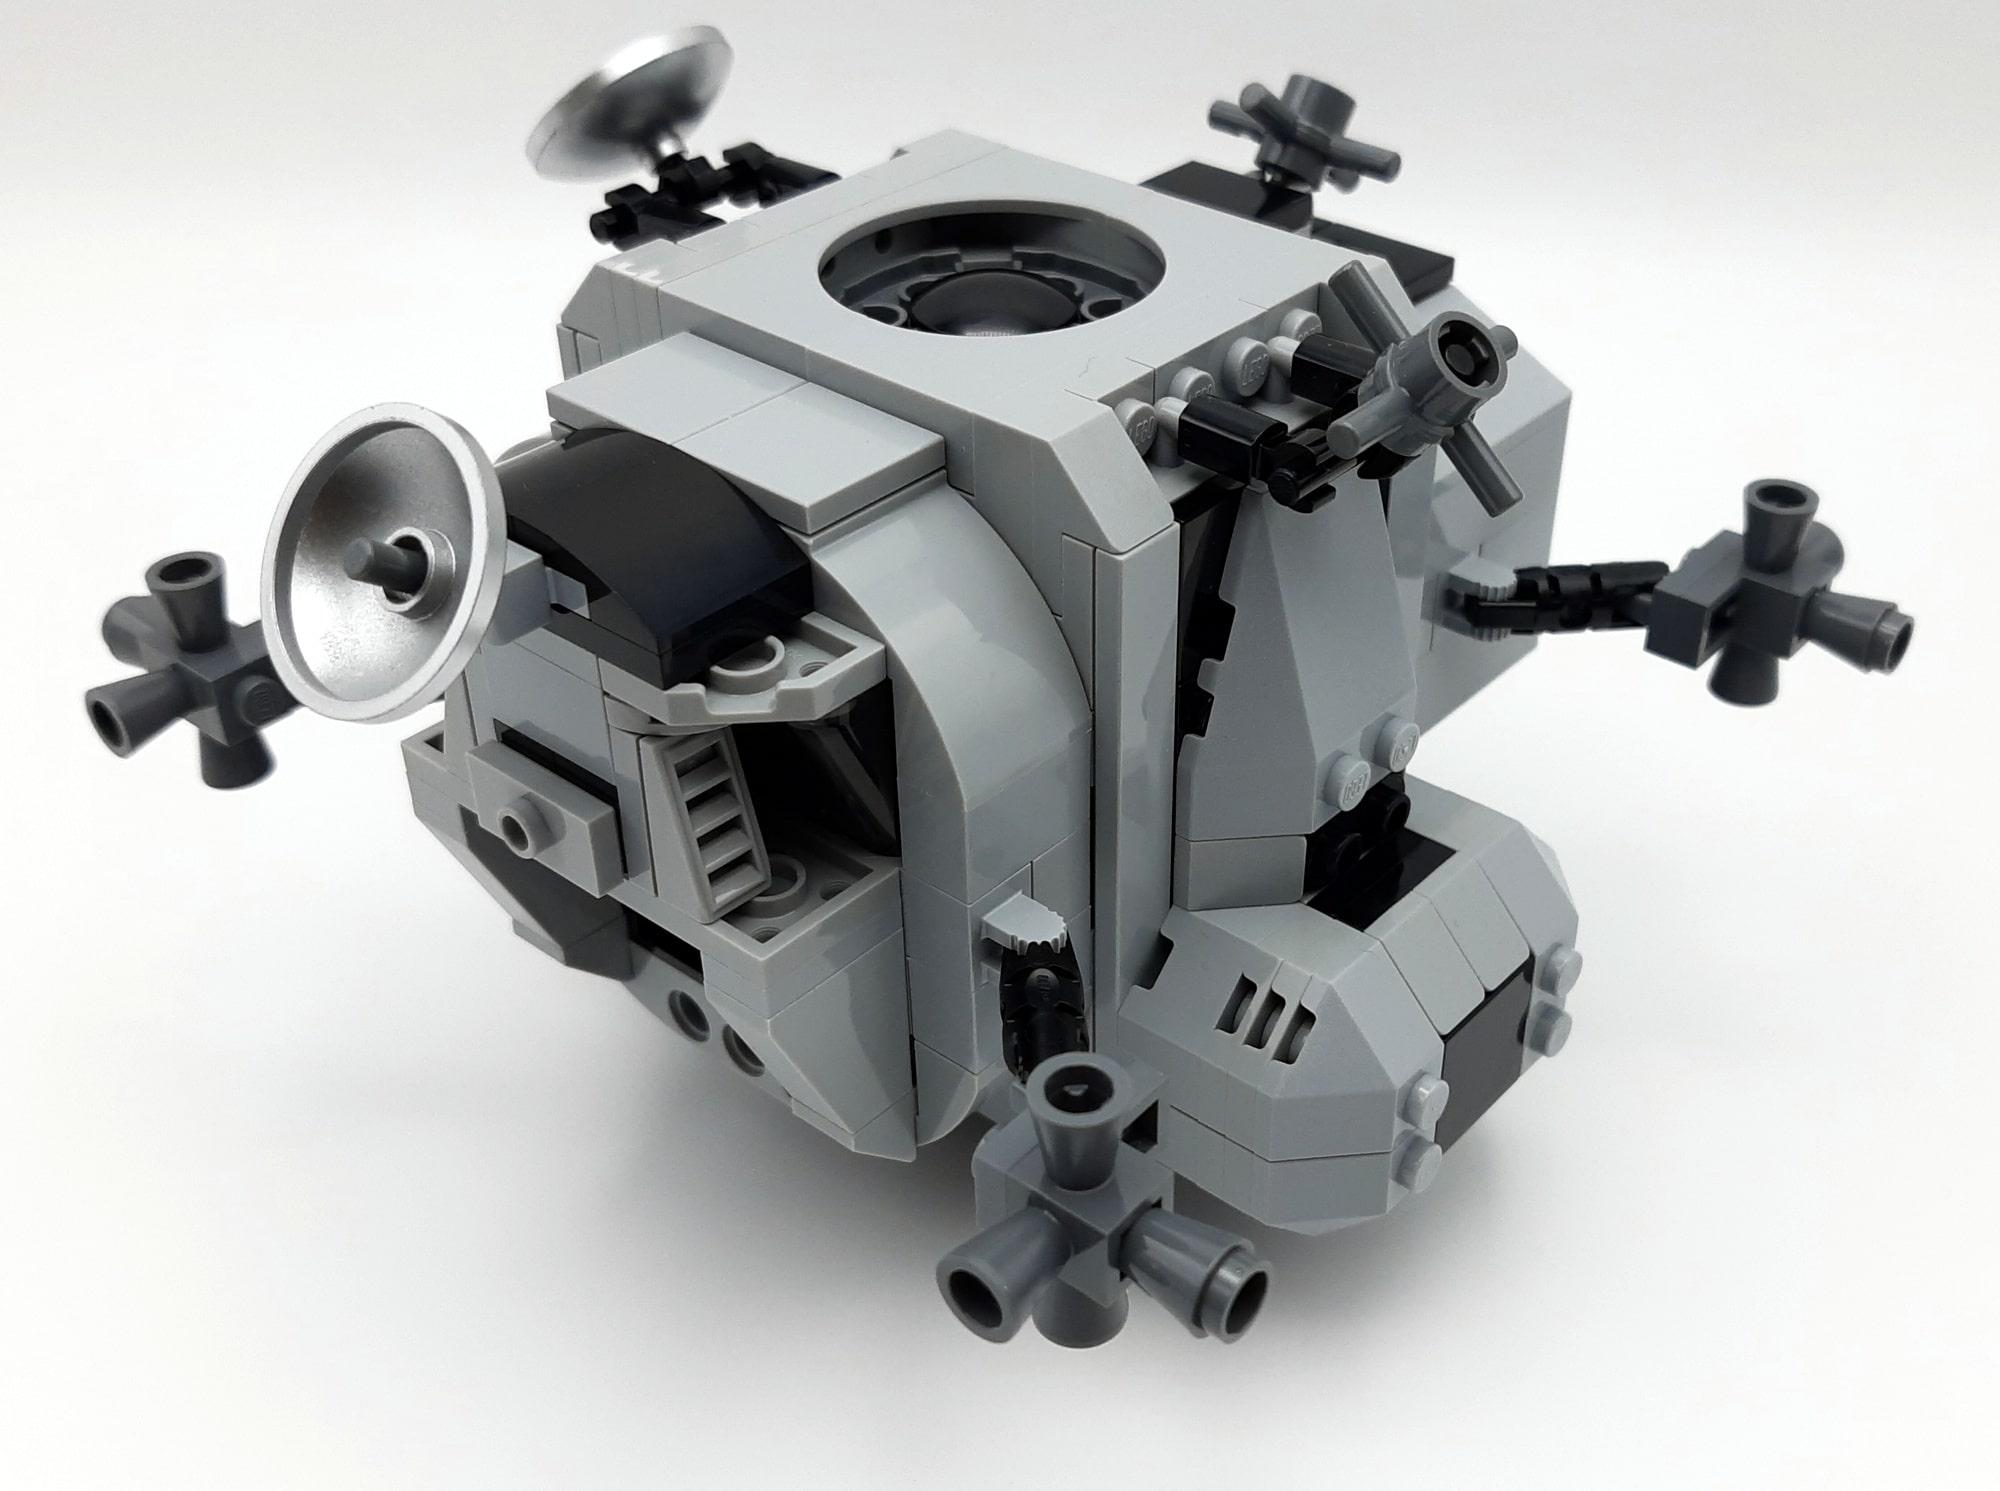 LEGO 10266 Nasa Apollo 11 Mondlandefähre - Bauabschnitt 4